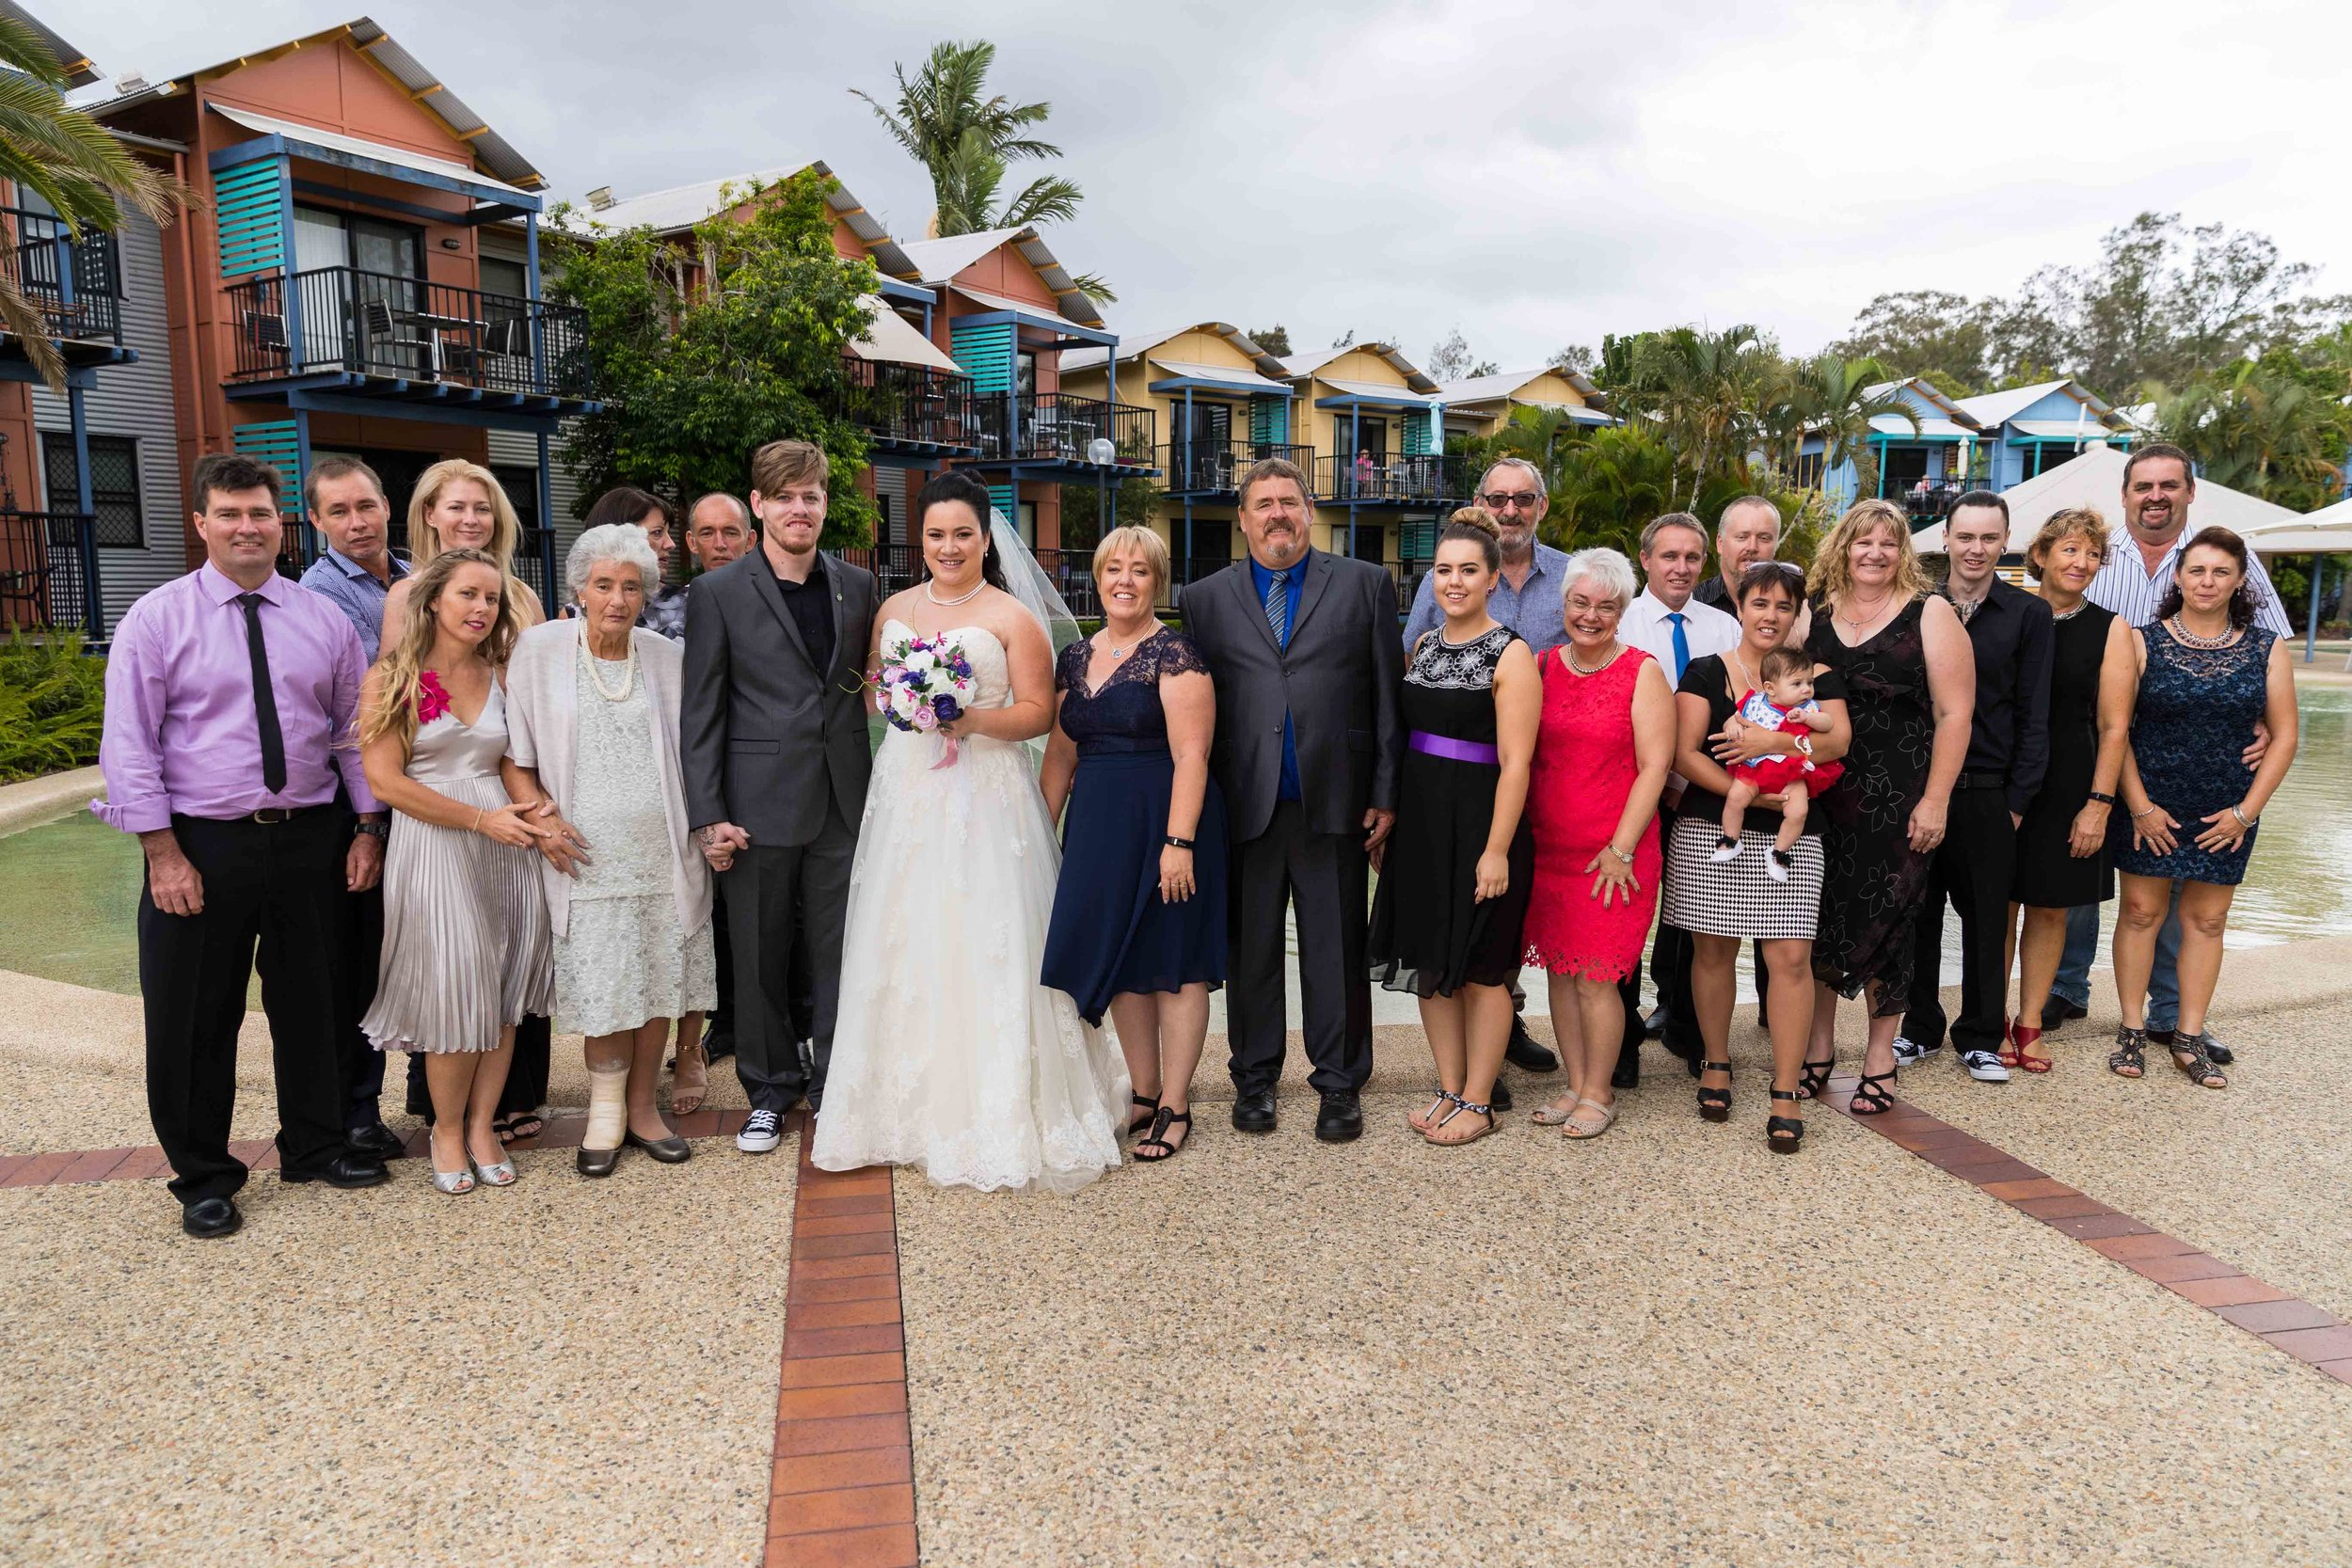 Woodeson_wedding-4353.jpg